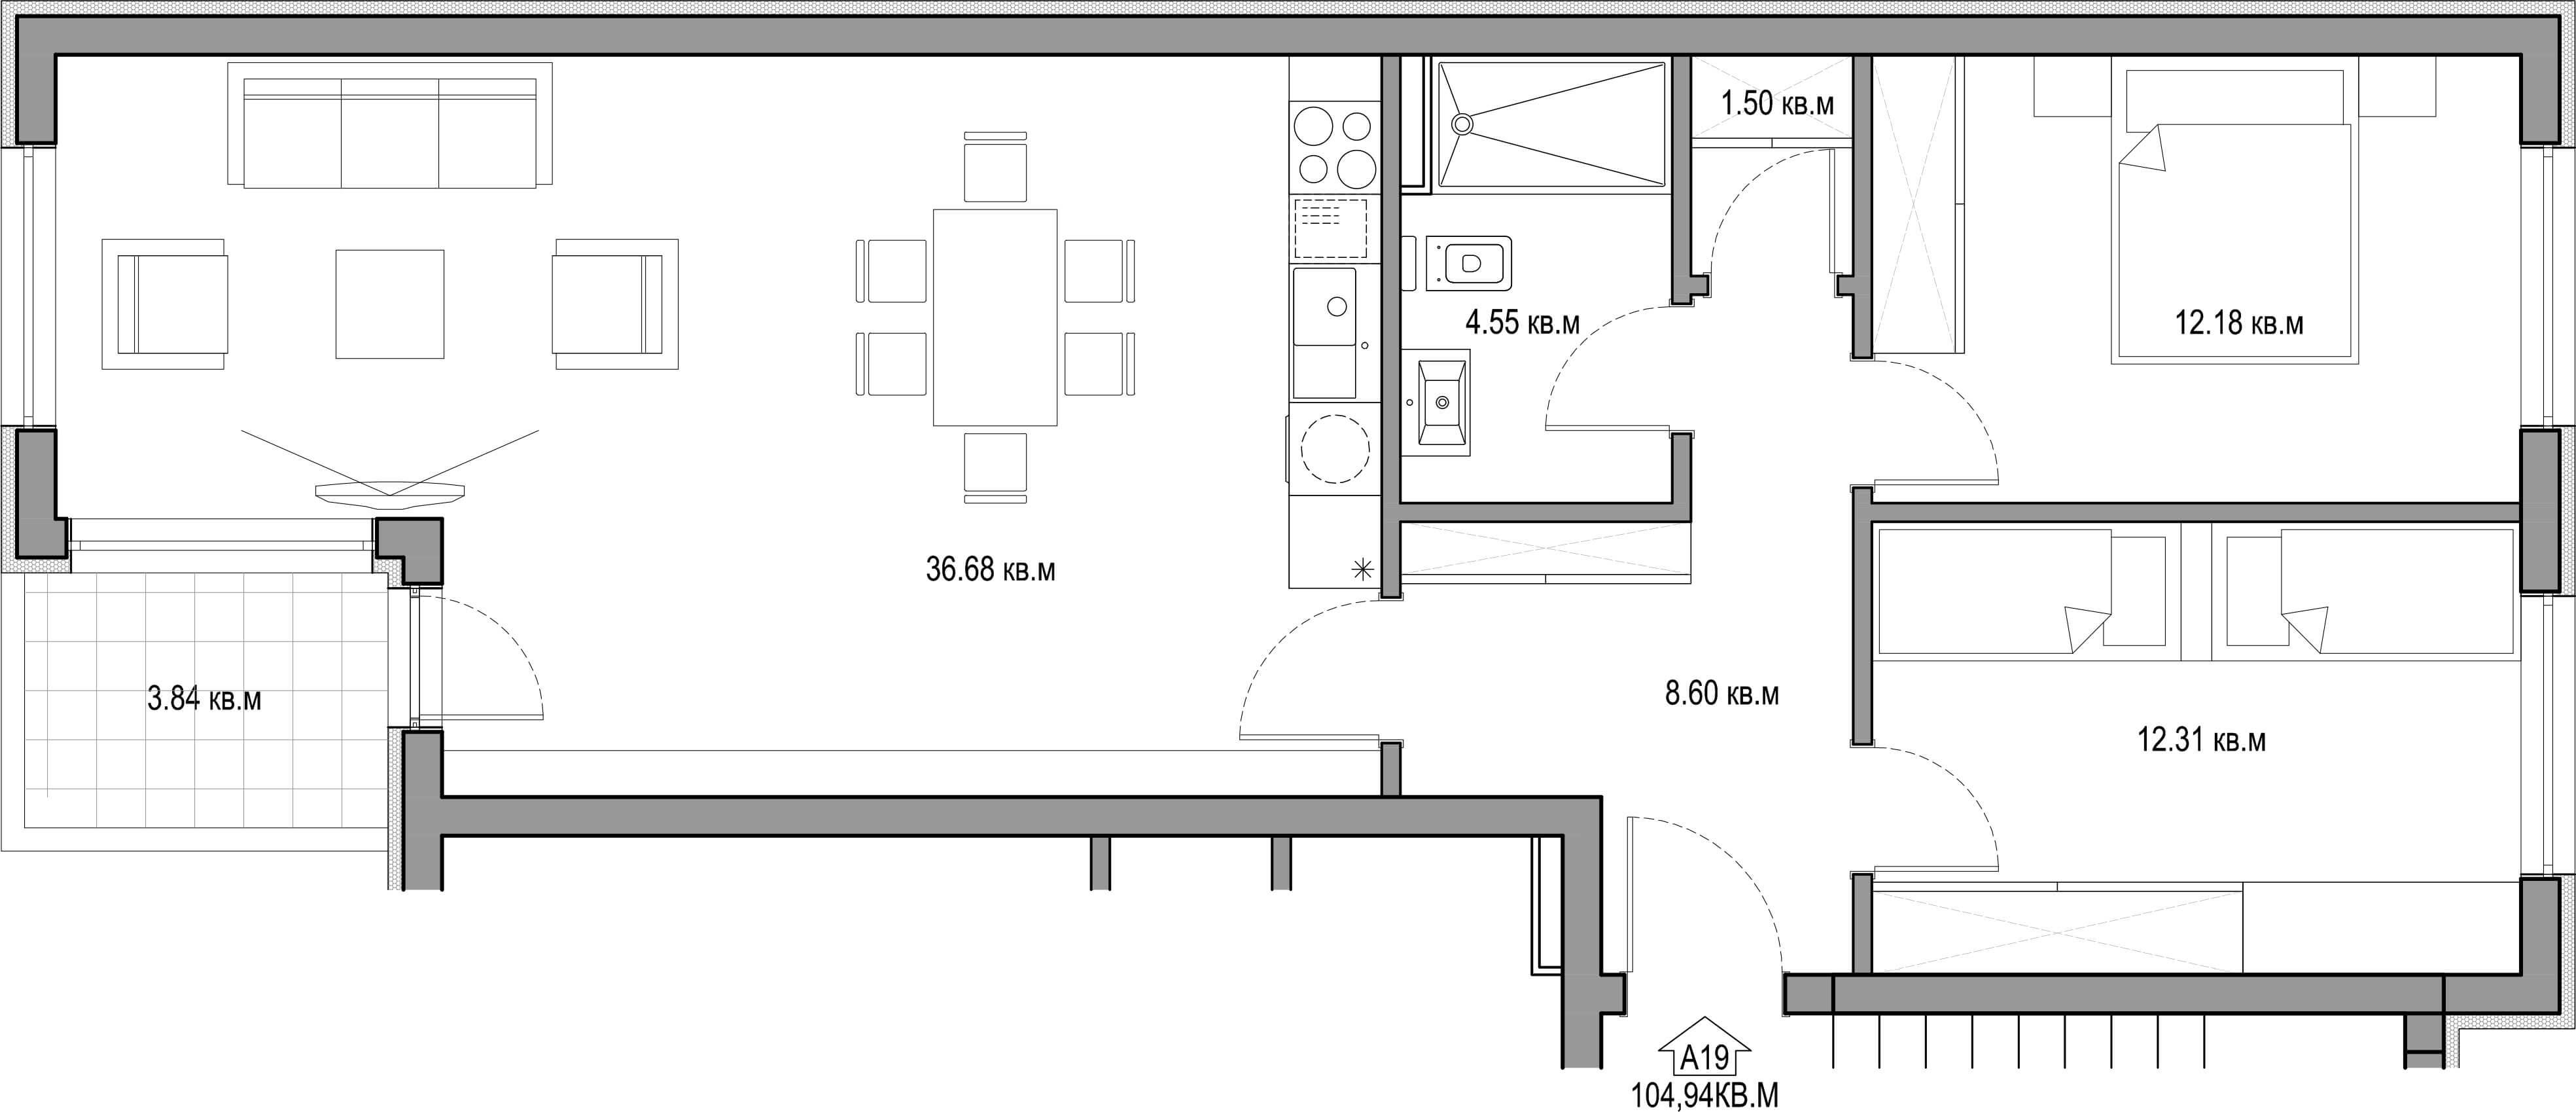 Vinitsa_Apartment_1_19